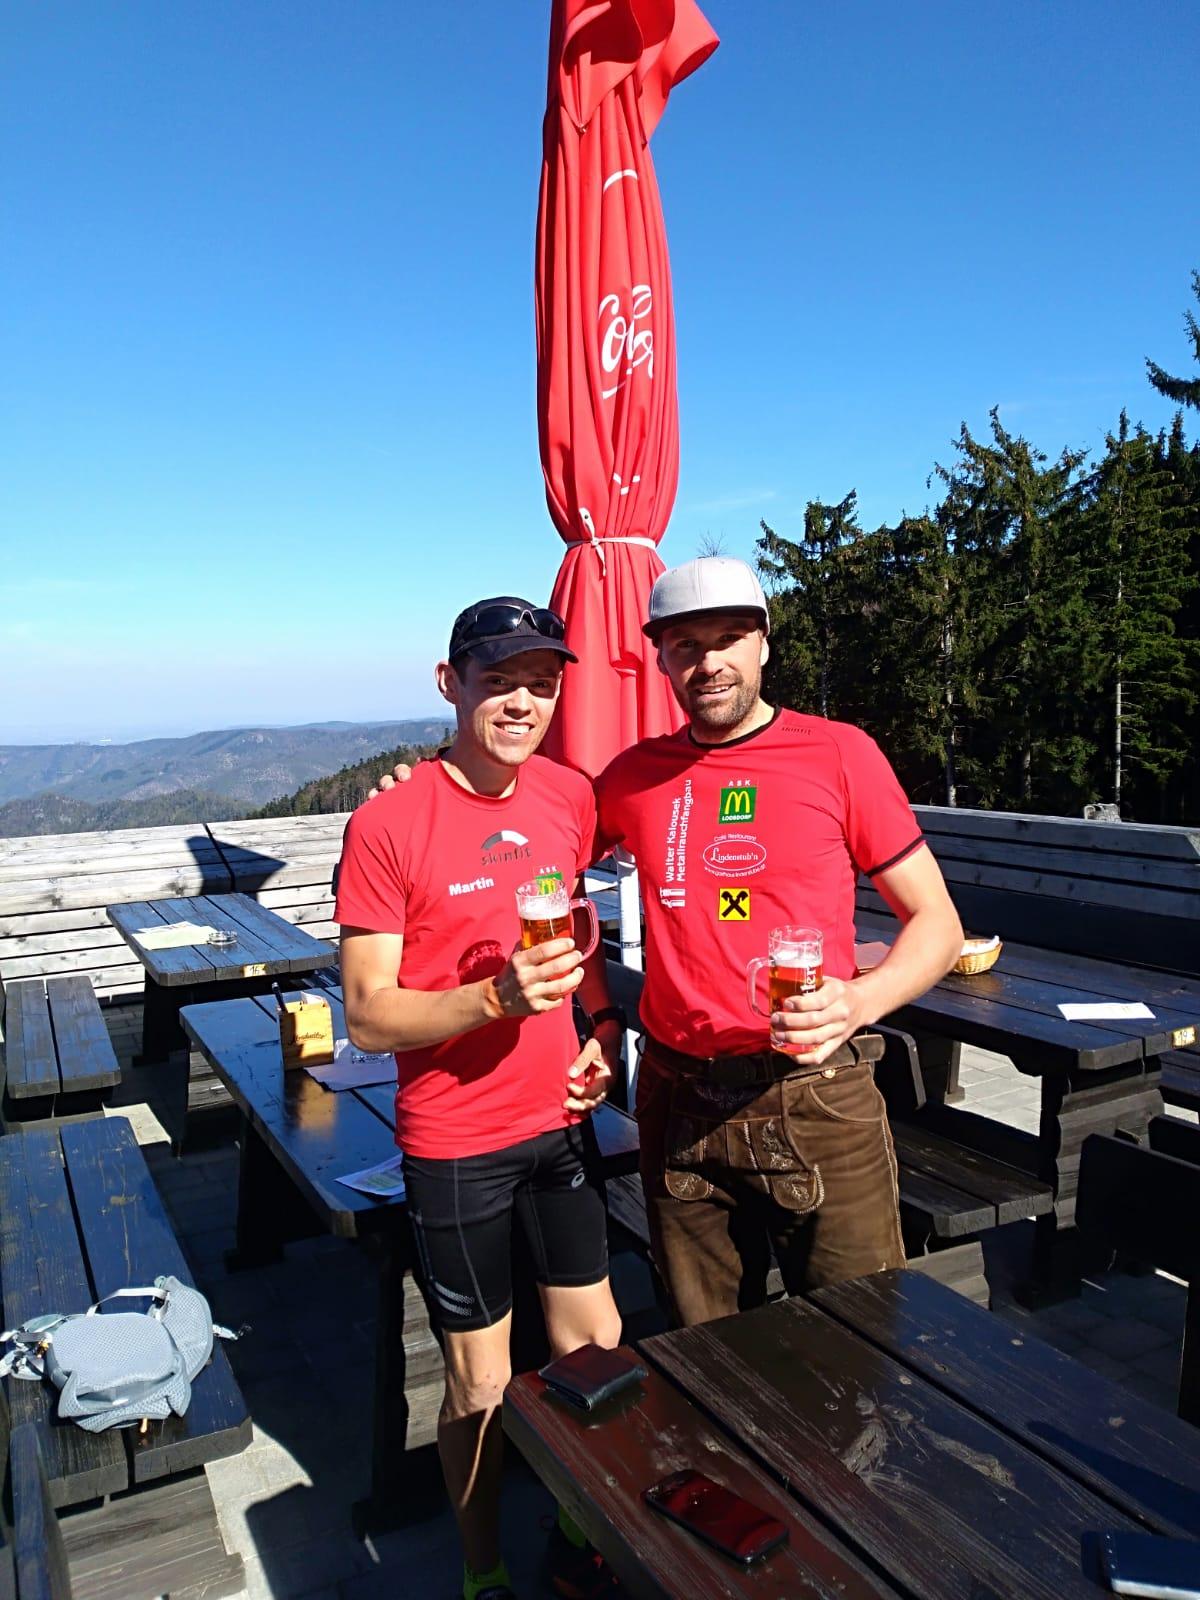 Unser Berglaufteam Jauerling: Martin & Jeff